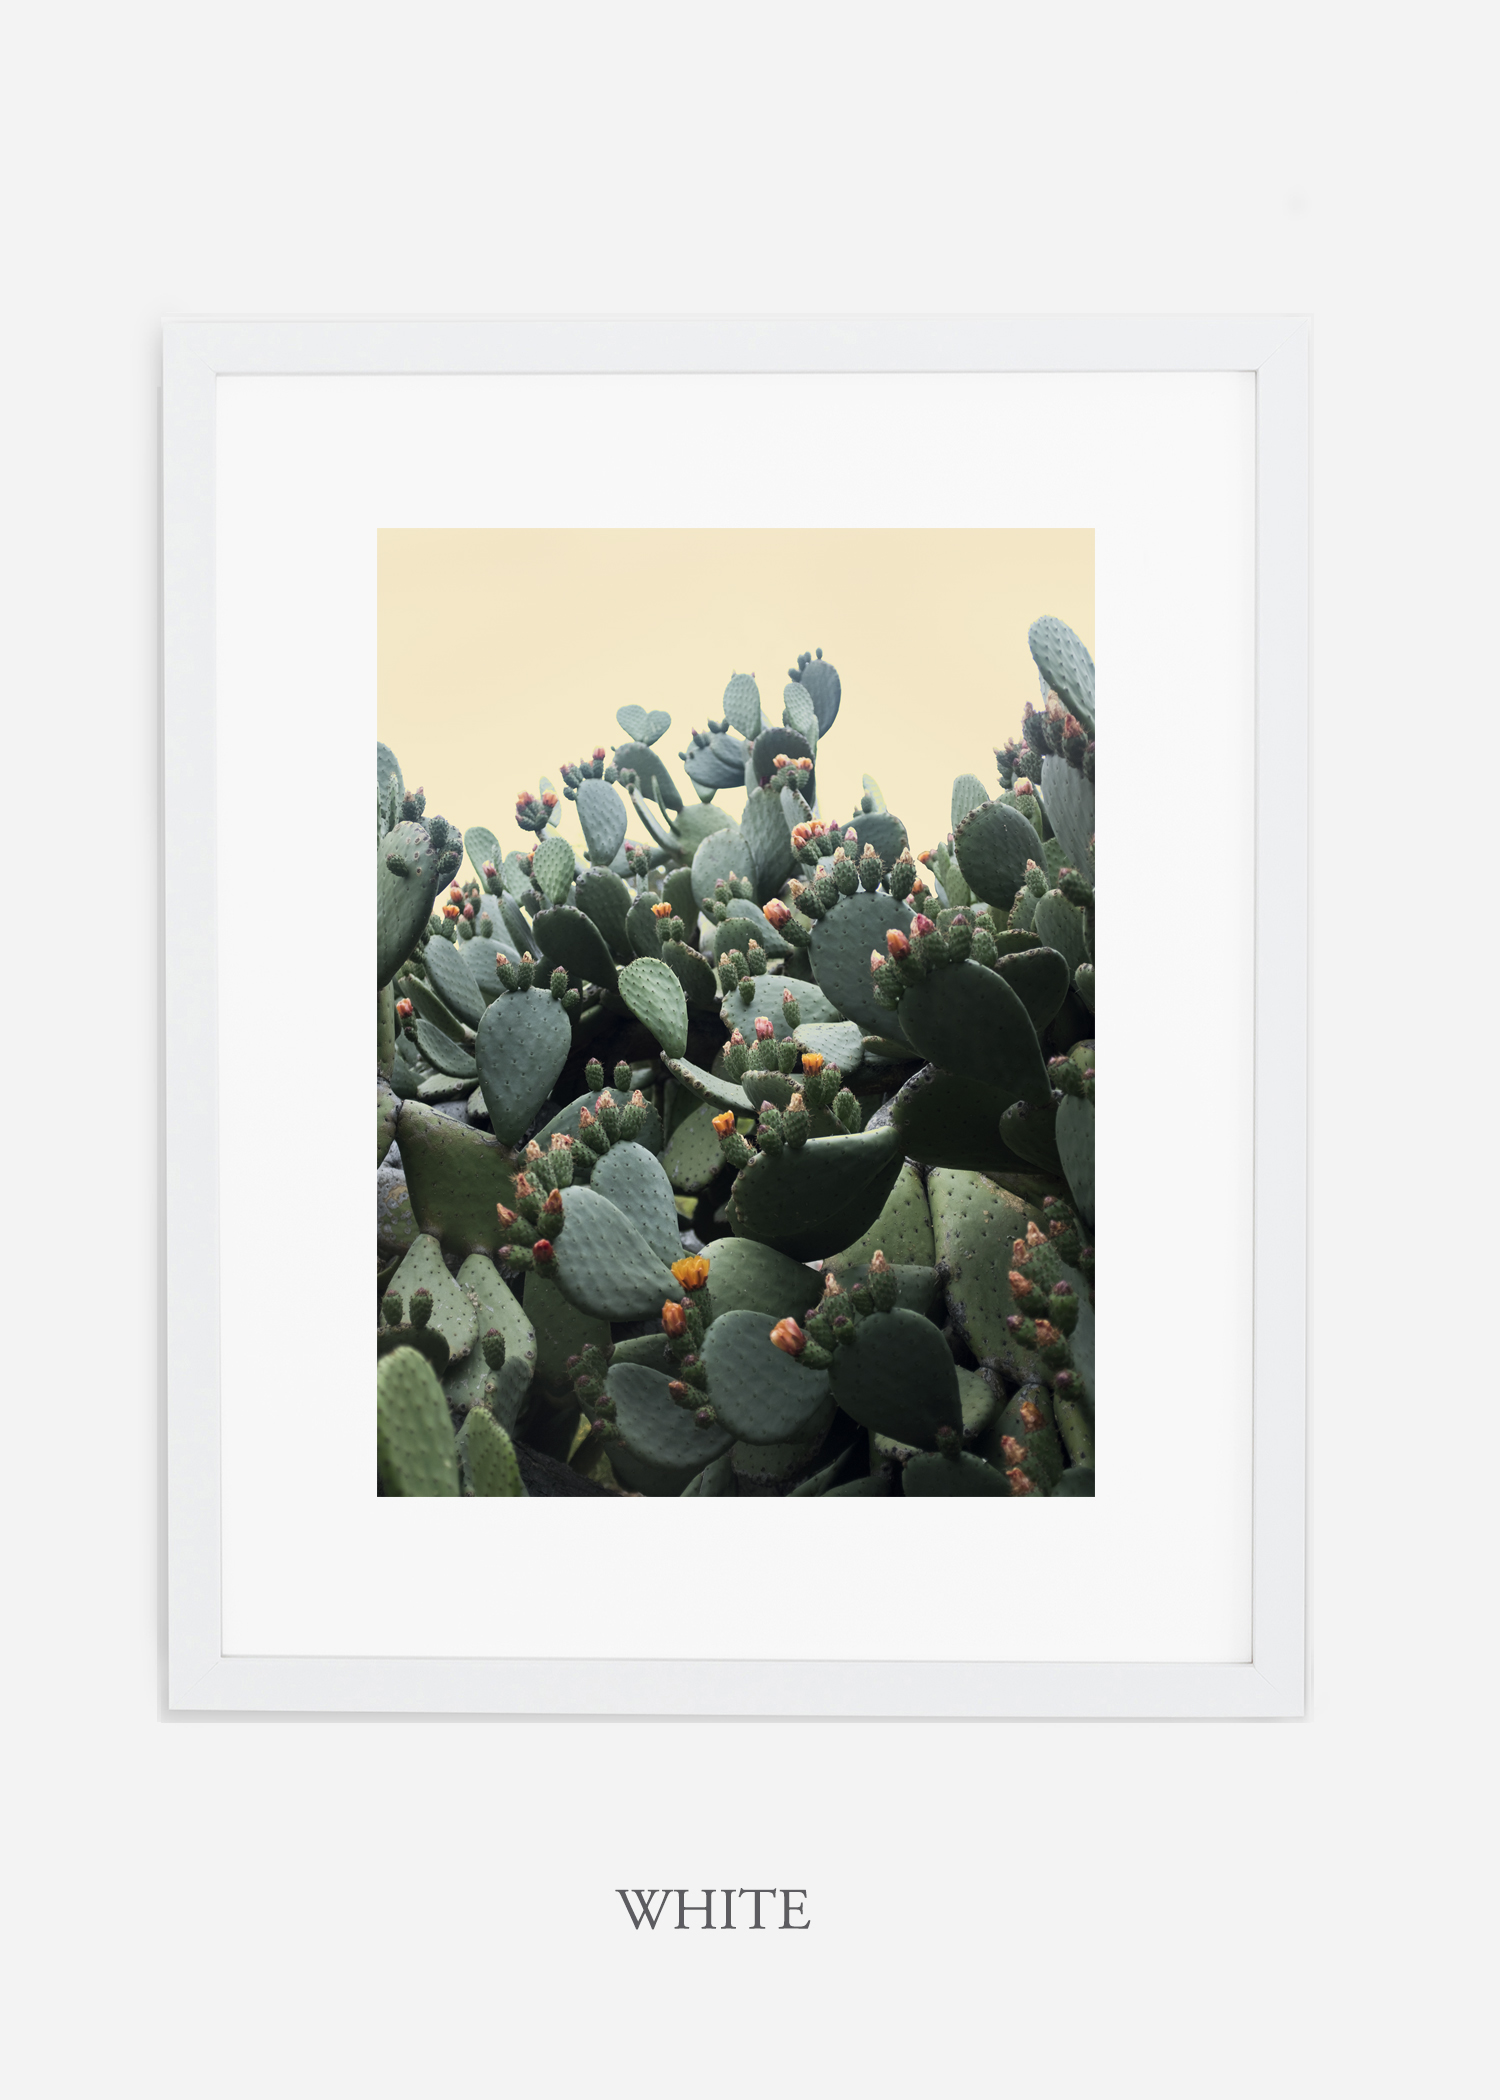 WilderCalifornia_whiteframe_CactusBloom_No1_Art_Photography_interiordesign_agave.jpg